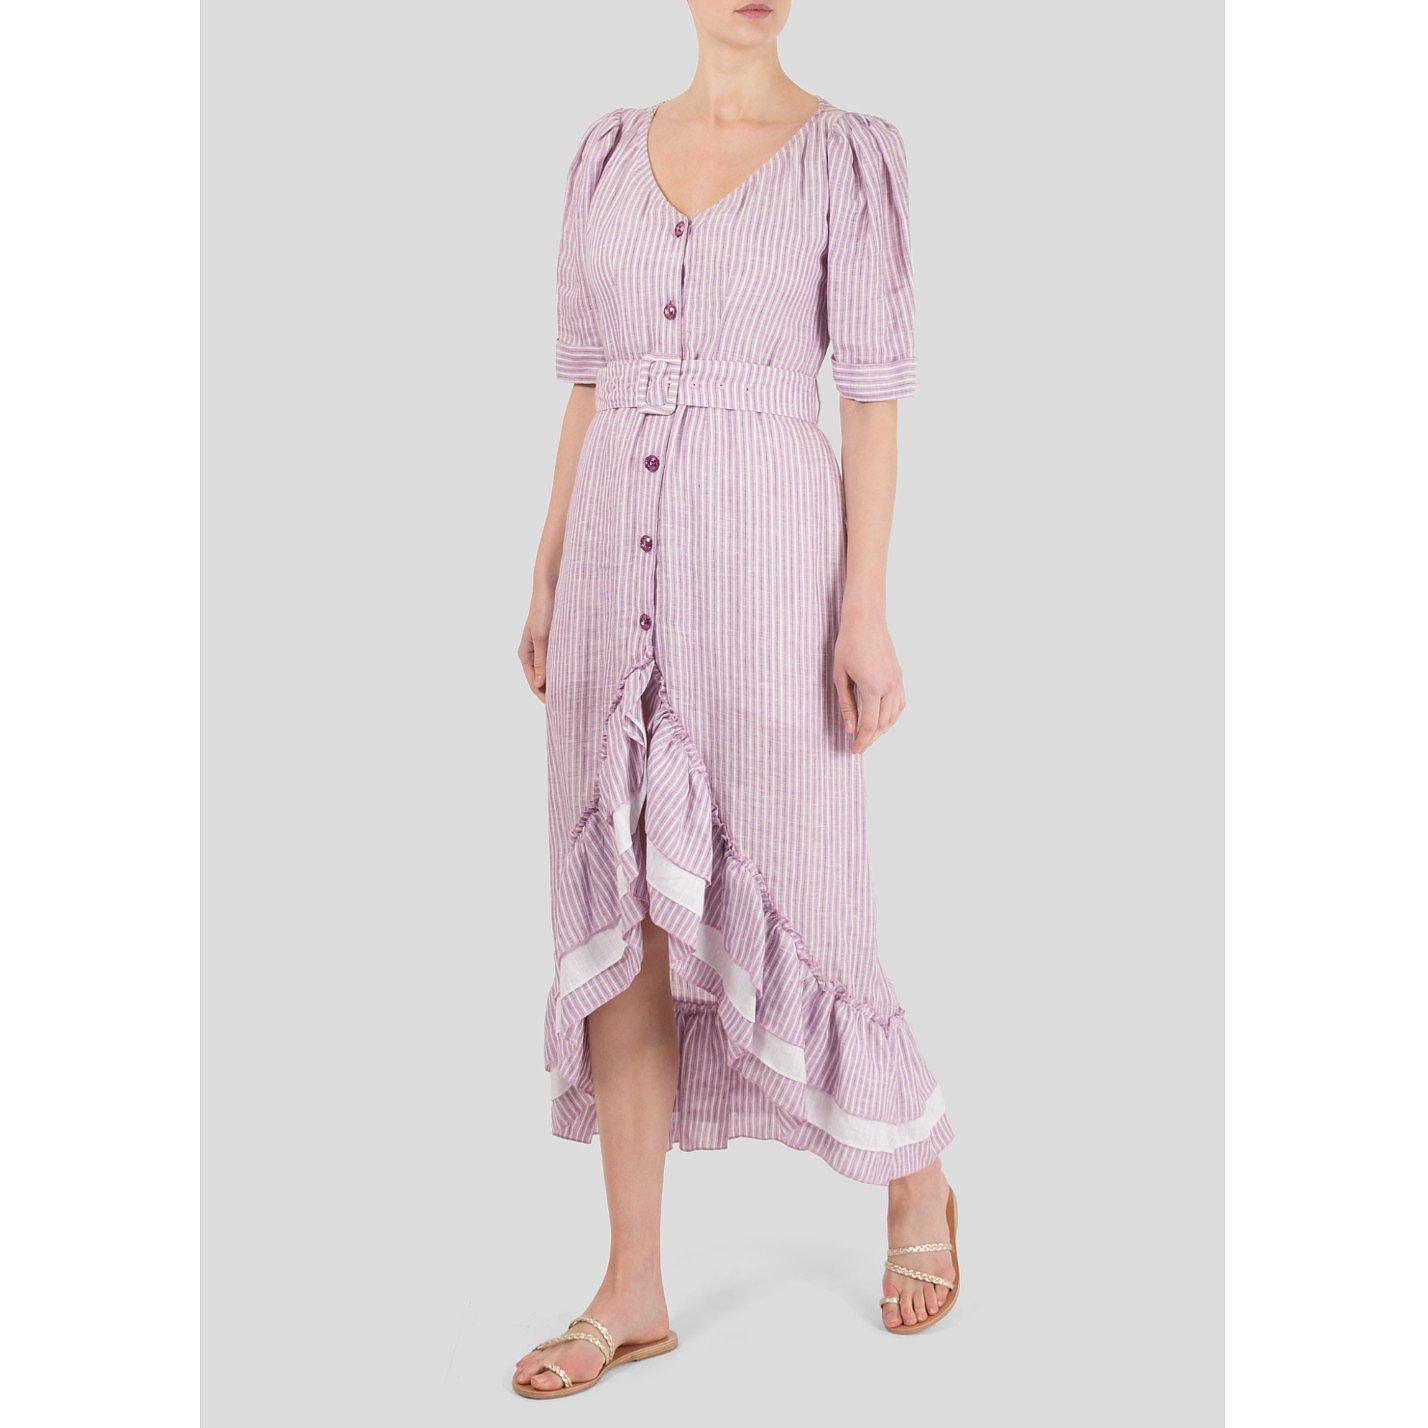 Gül Hürgel Linen Sun Dress